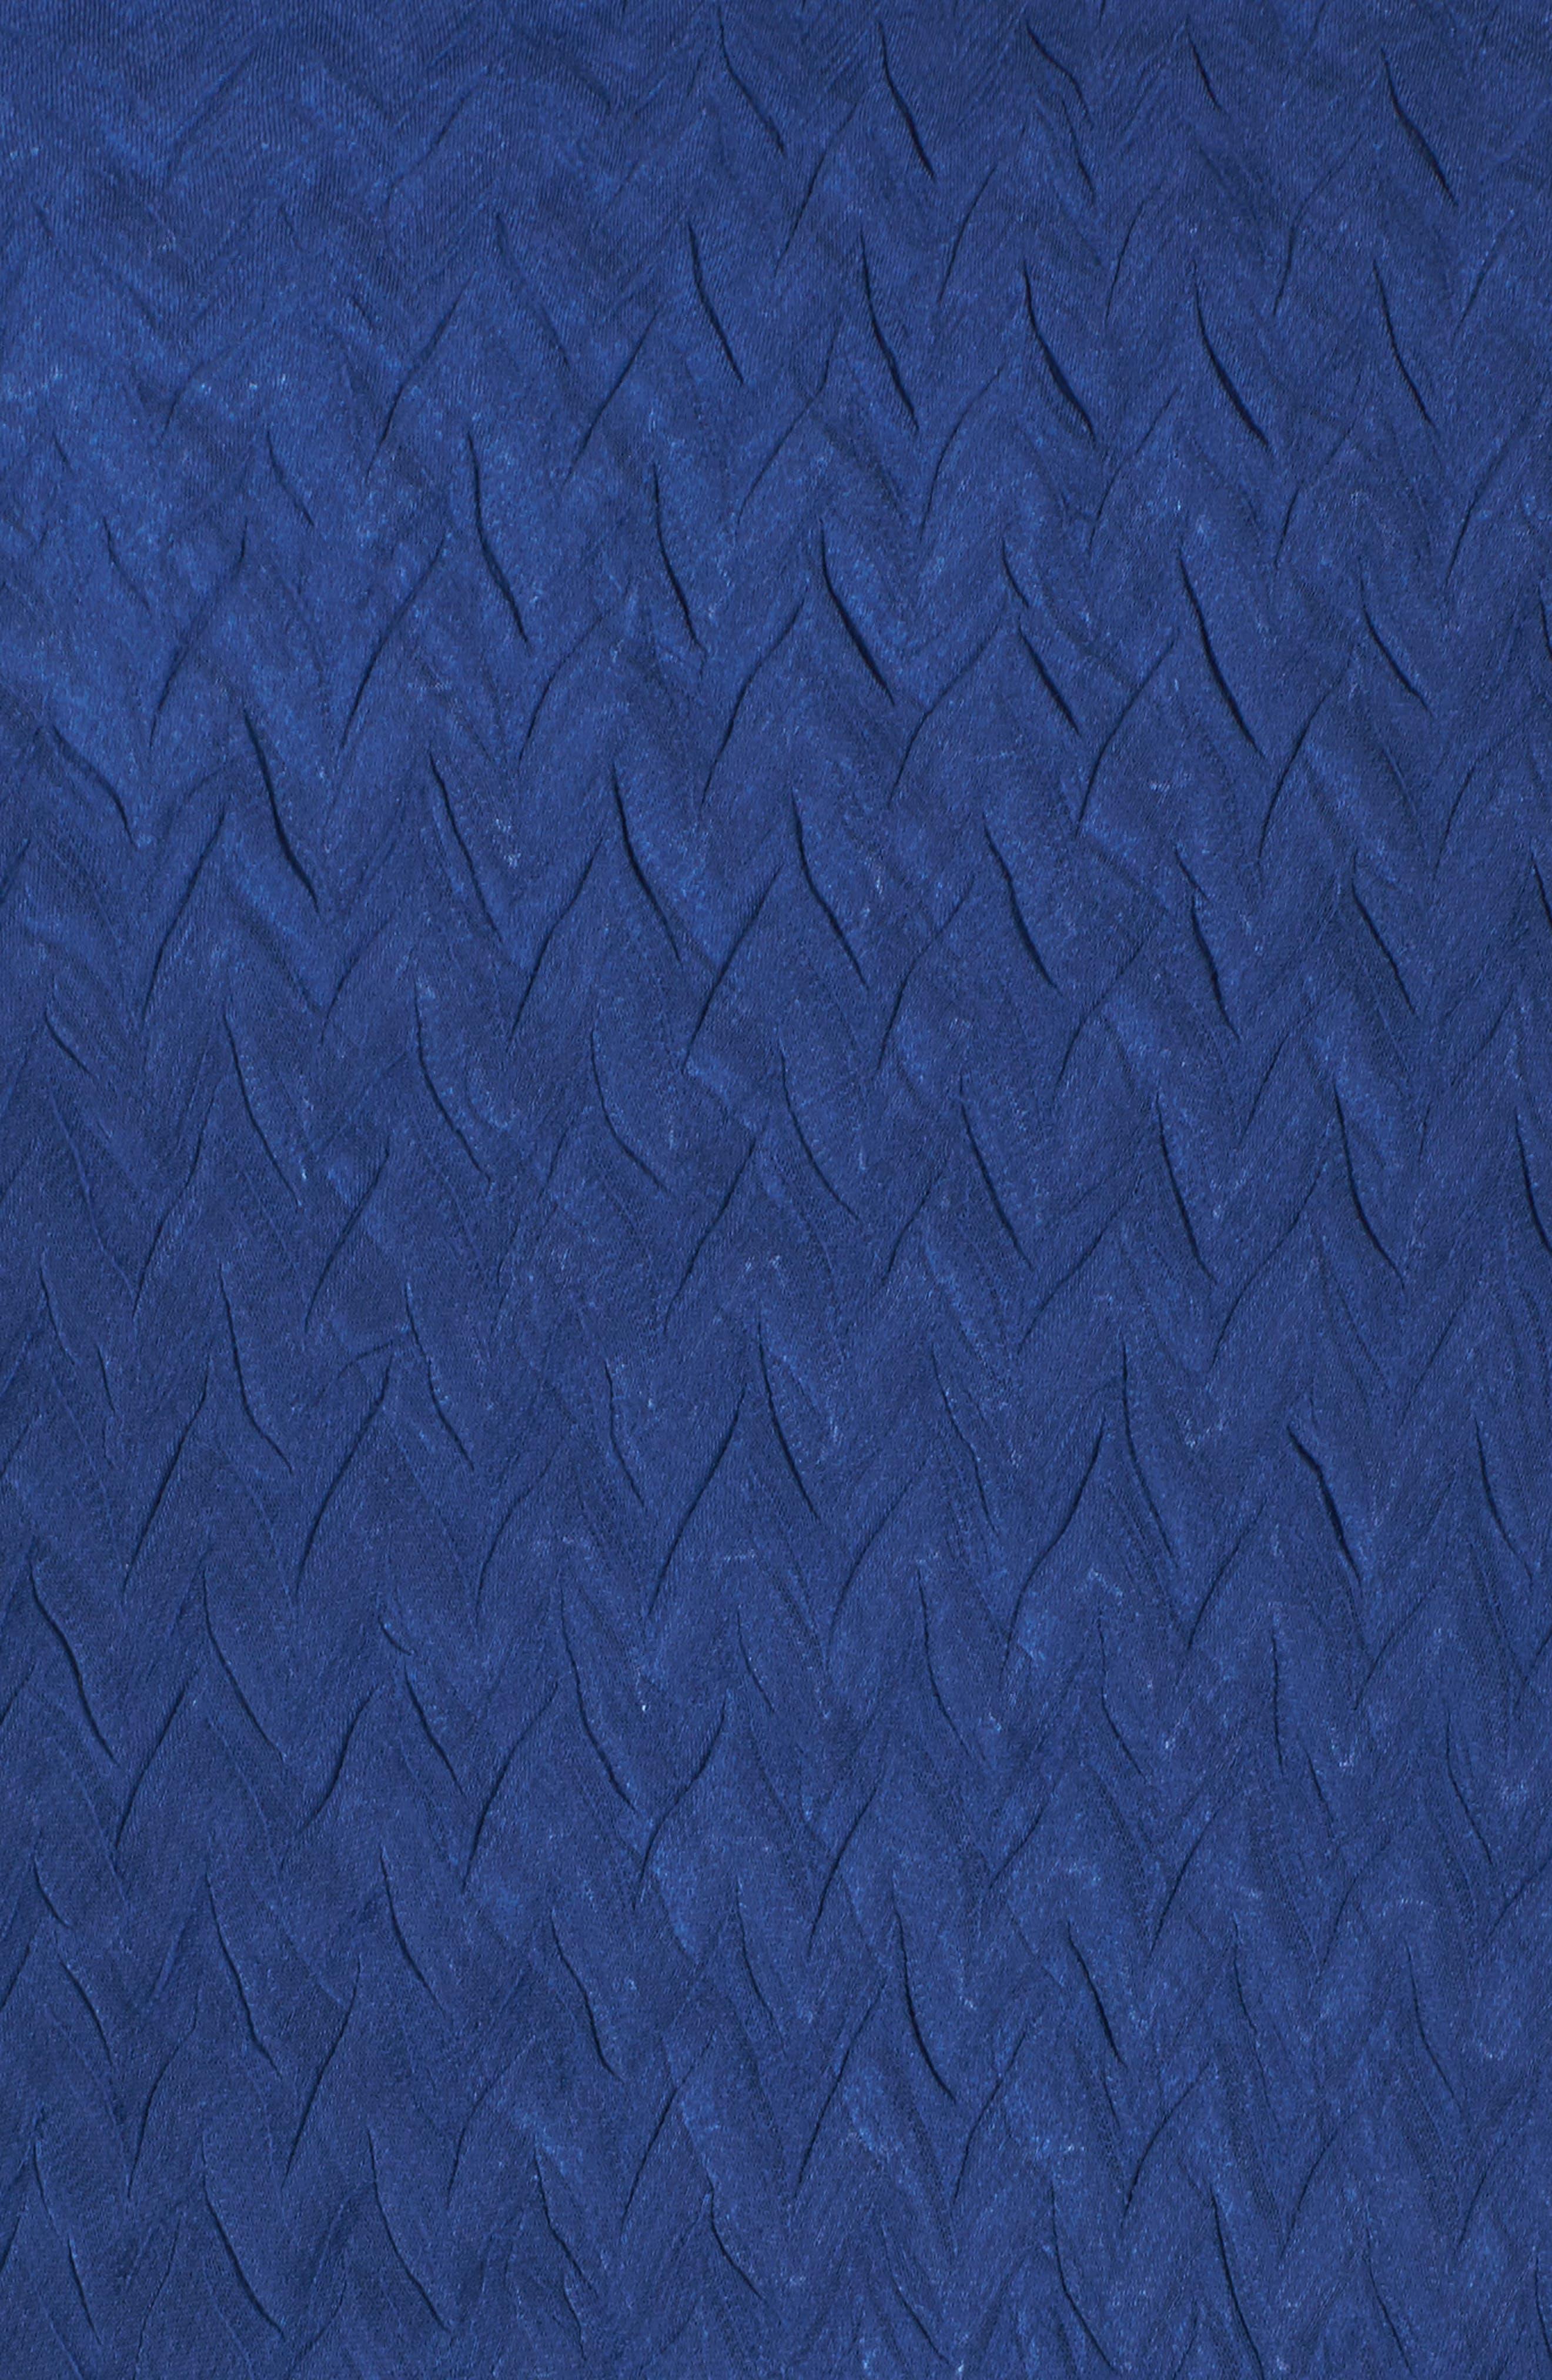 Charmeuse & Chiffon A-Line Dress,                             Alternate thumbnail 5, color,                             484